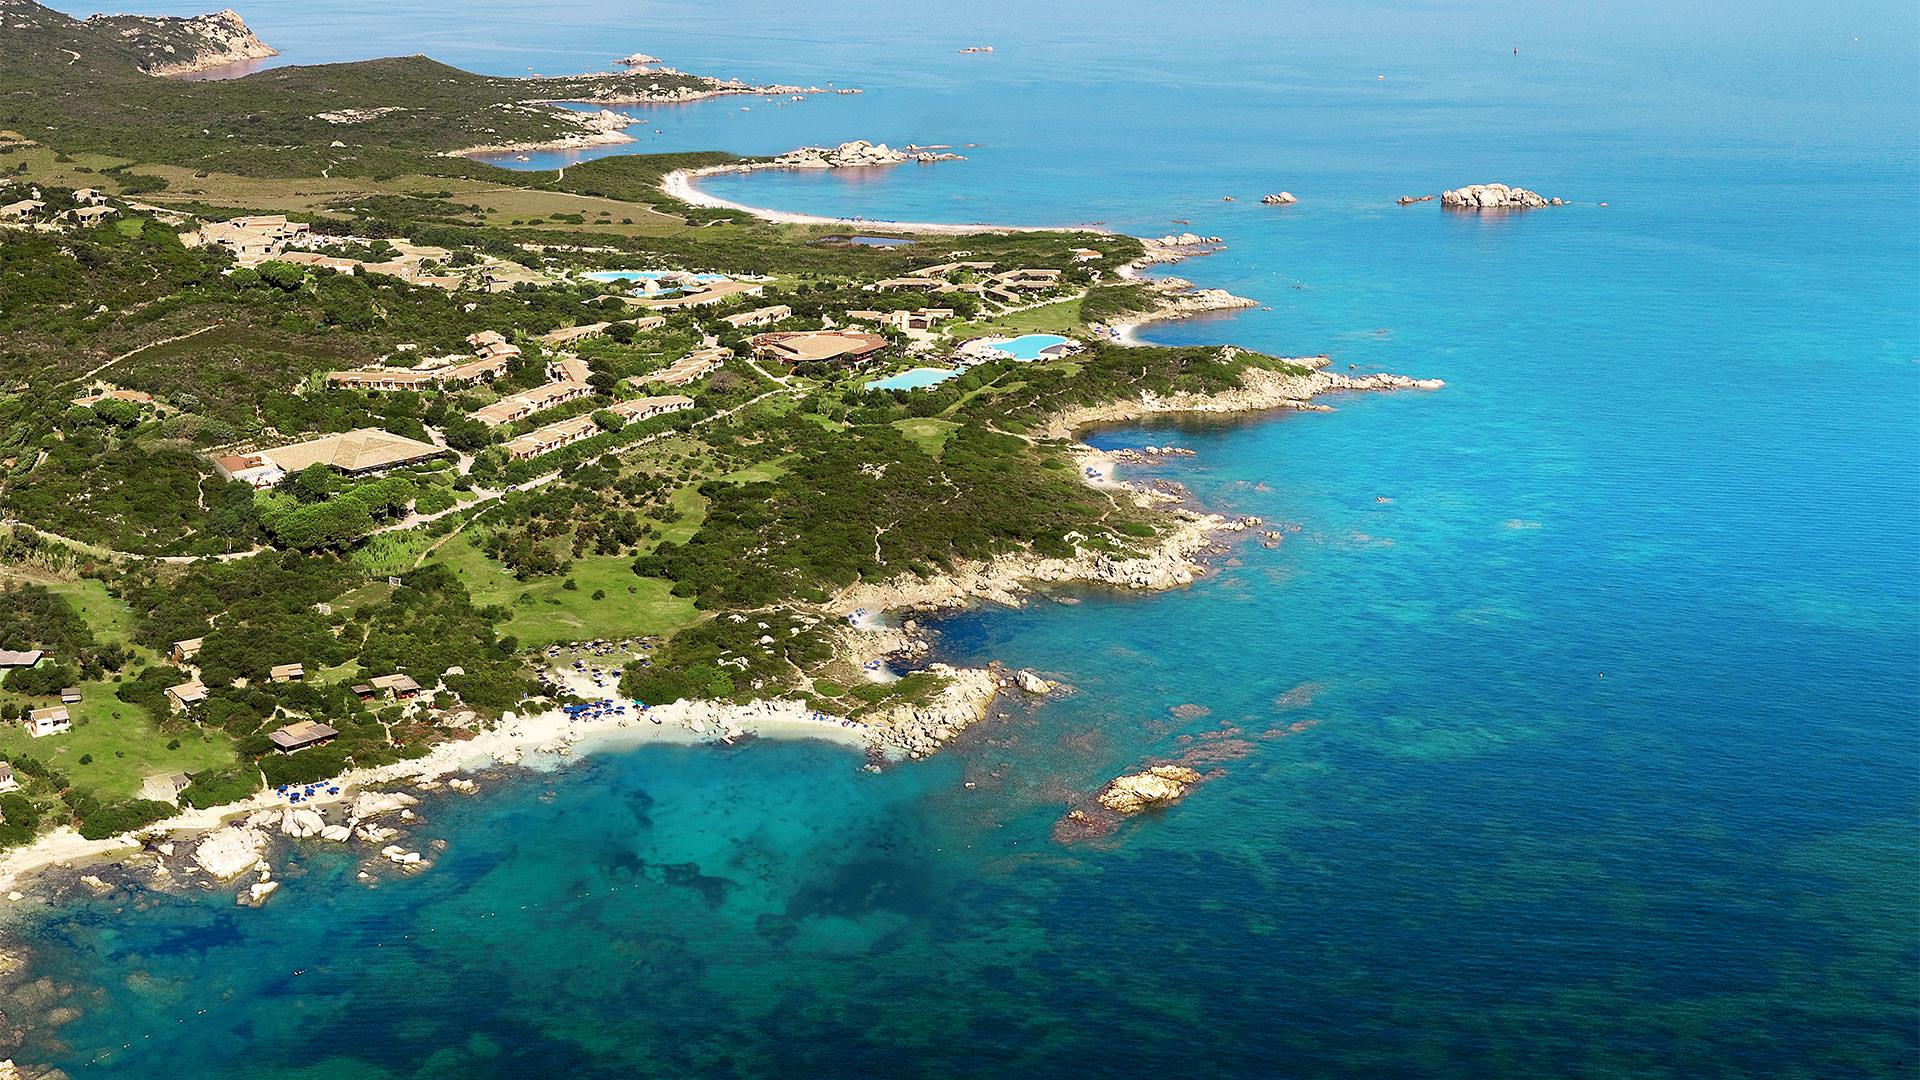 resort-valle-erica-slider-hotel-valle-erica-spiaggia-sardegna-mare-santa-teresa-gallura-mini